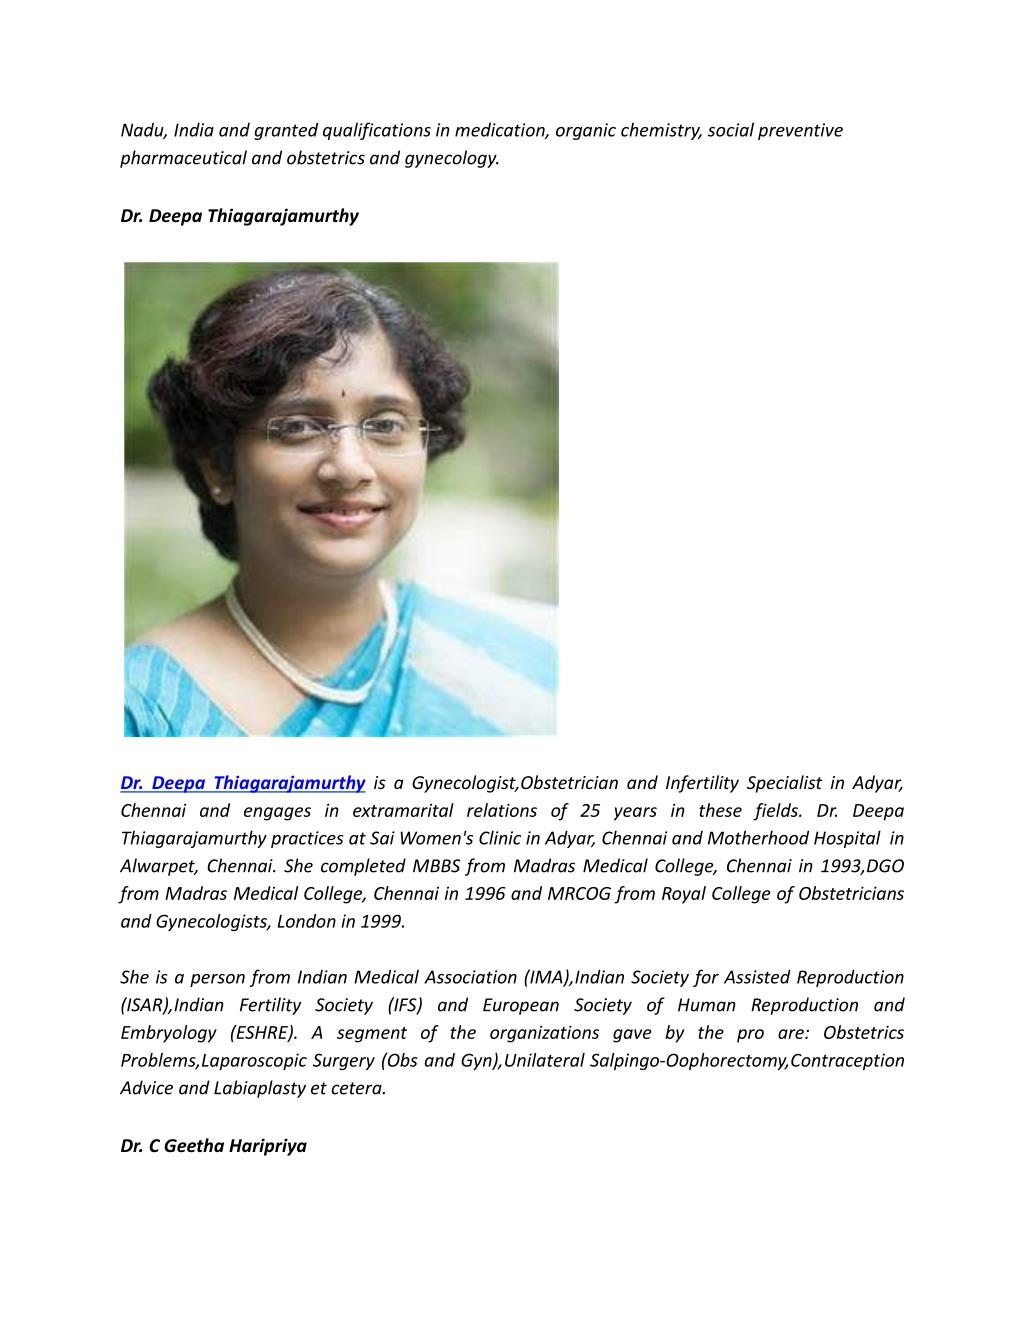 PPT - Best Gynecologists in Chennai | Dr  Geetha Haripriya